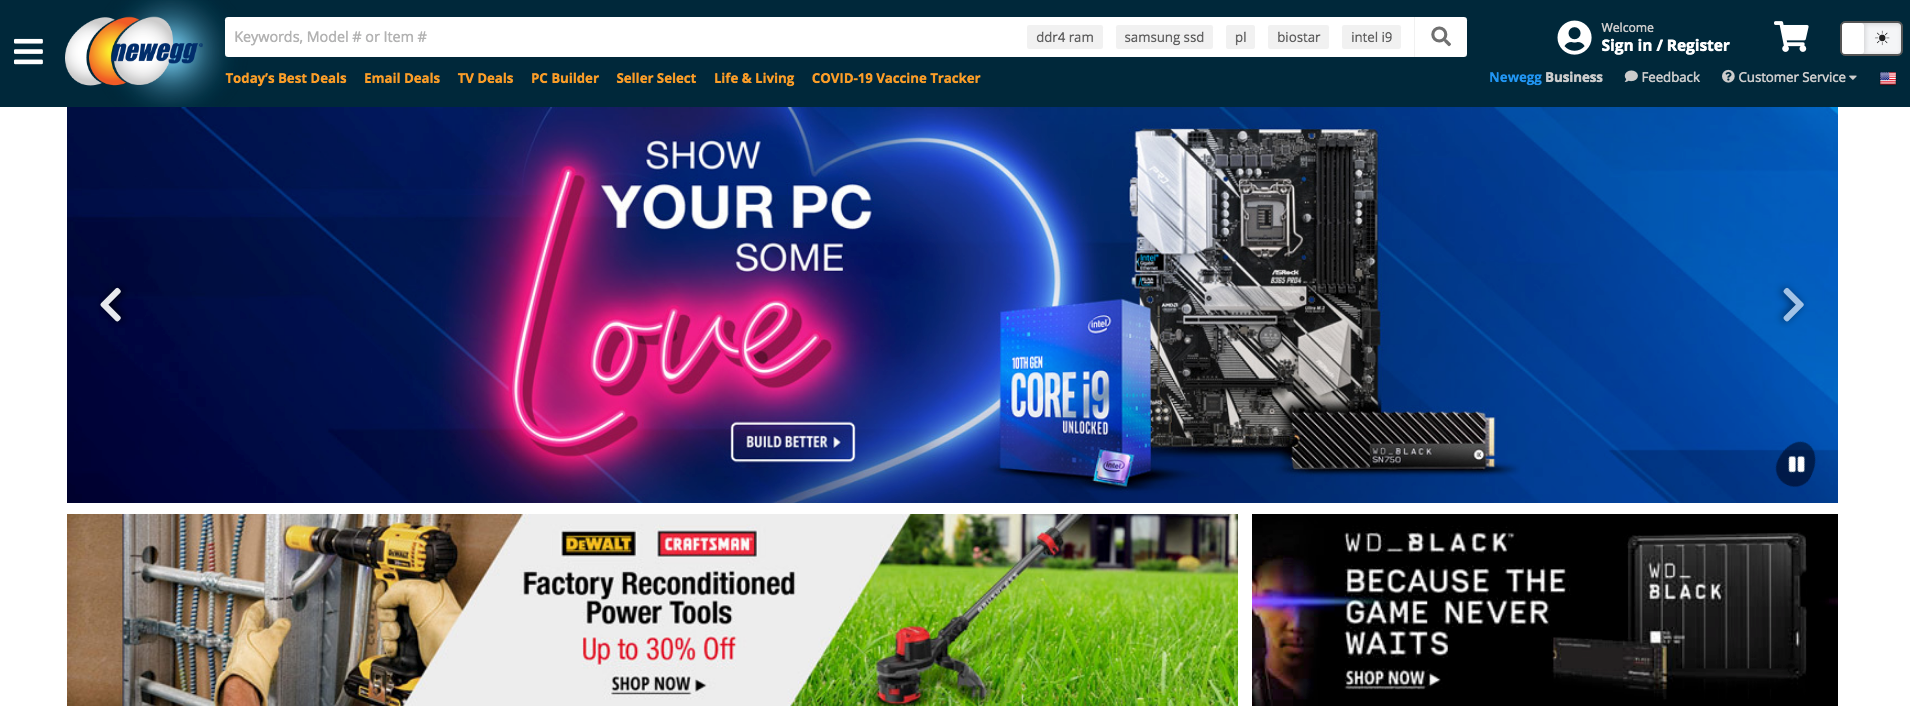 How does online marketplace Newegg make money